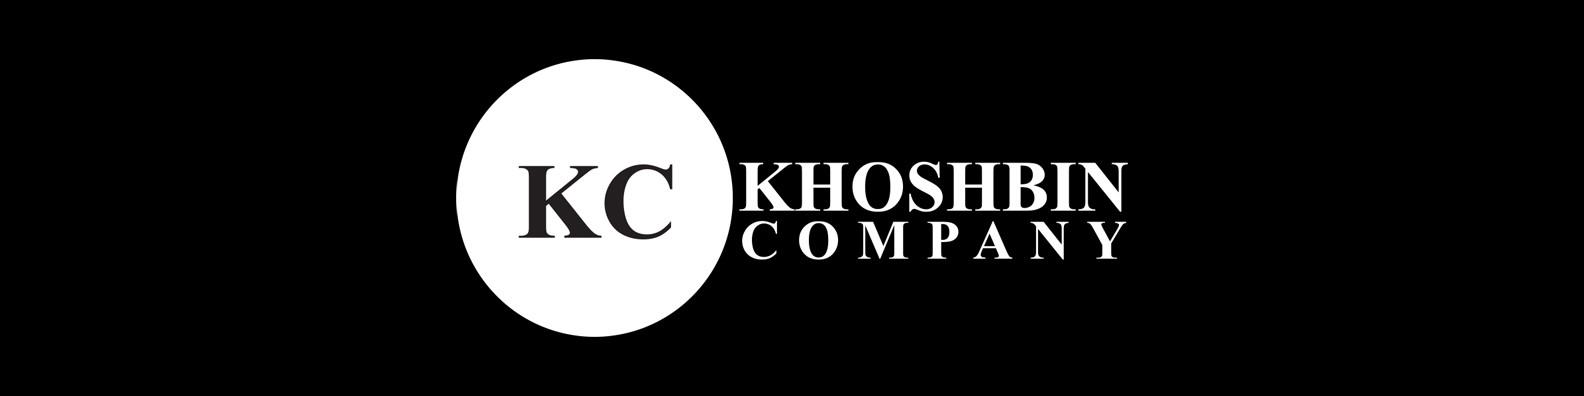 Mazi Khoshbin: The Inspiring Story of a Holistic Entrepreneur